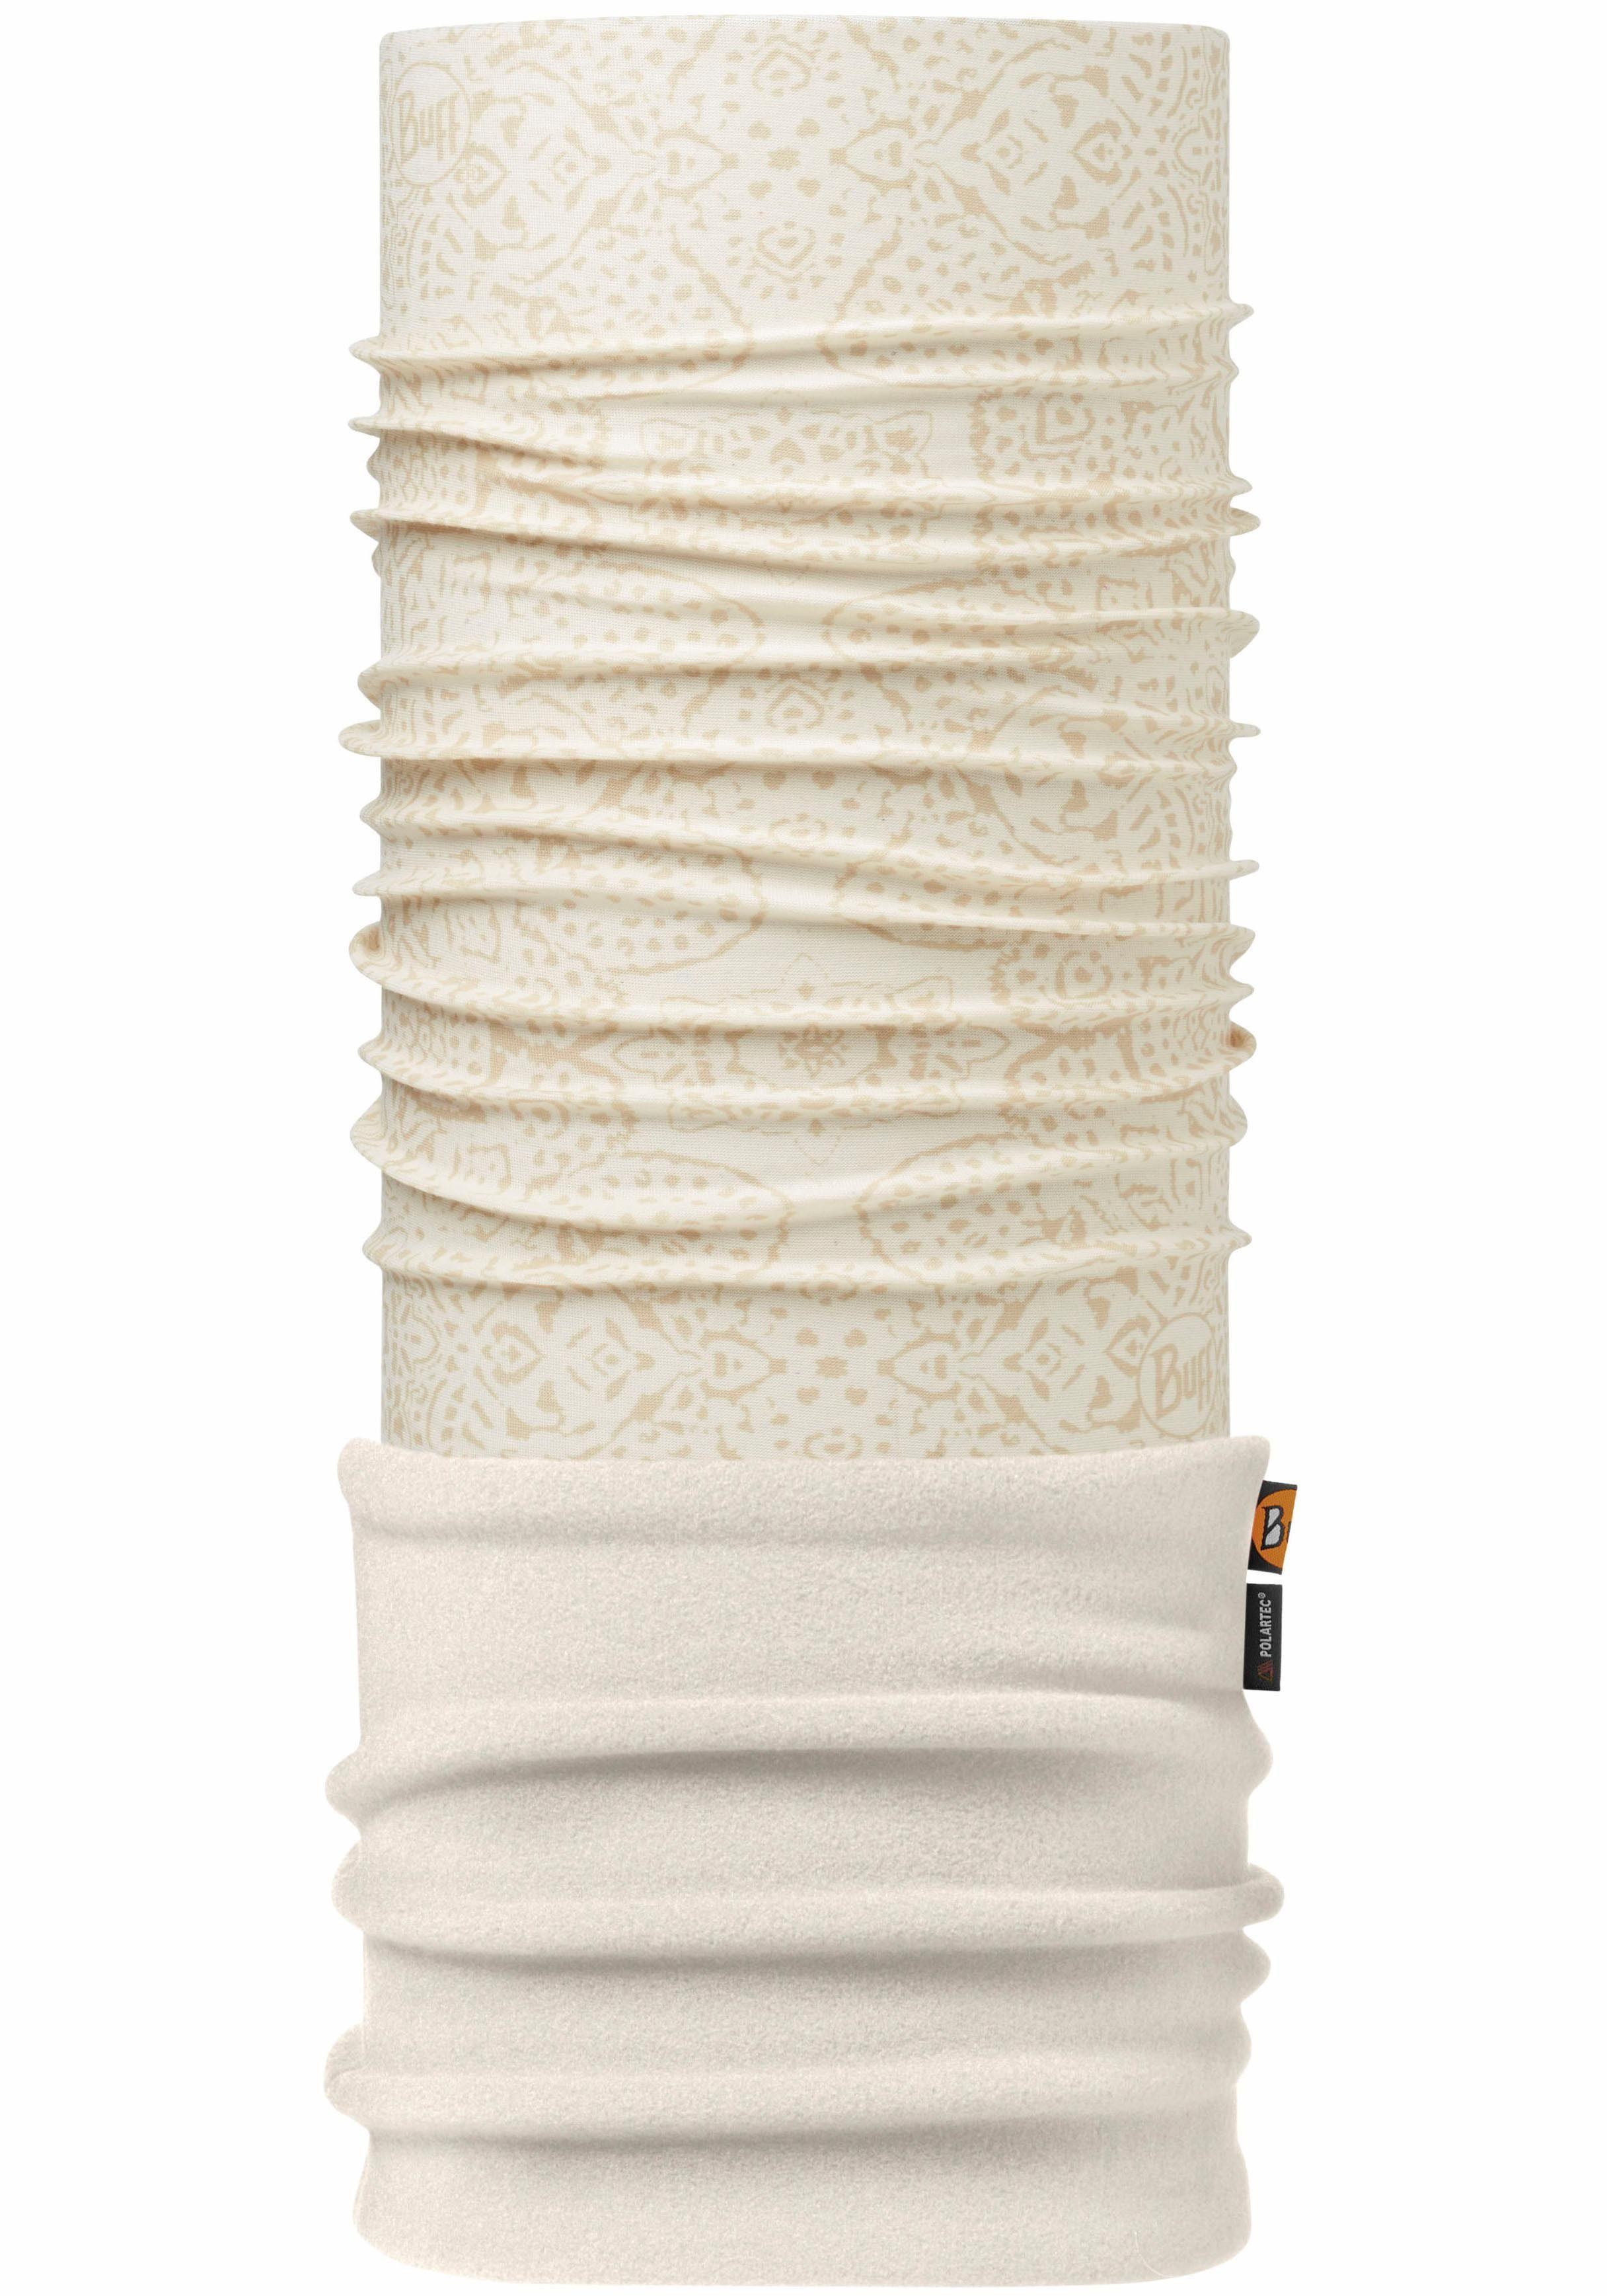 Buff Multifunktionstuch »Polar Buff®« Hals- oder Kopftuch